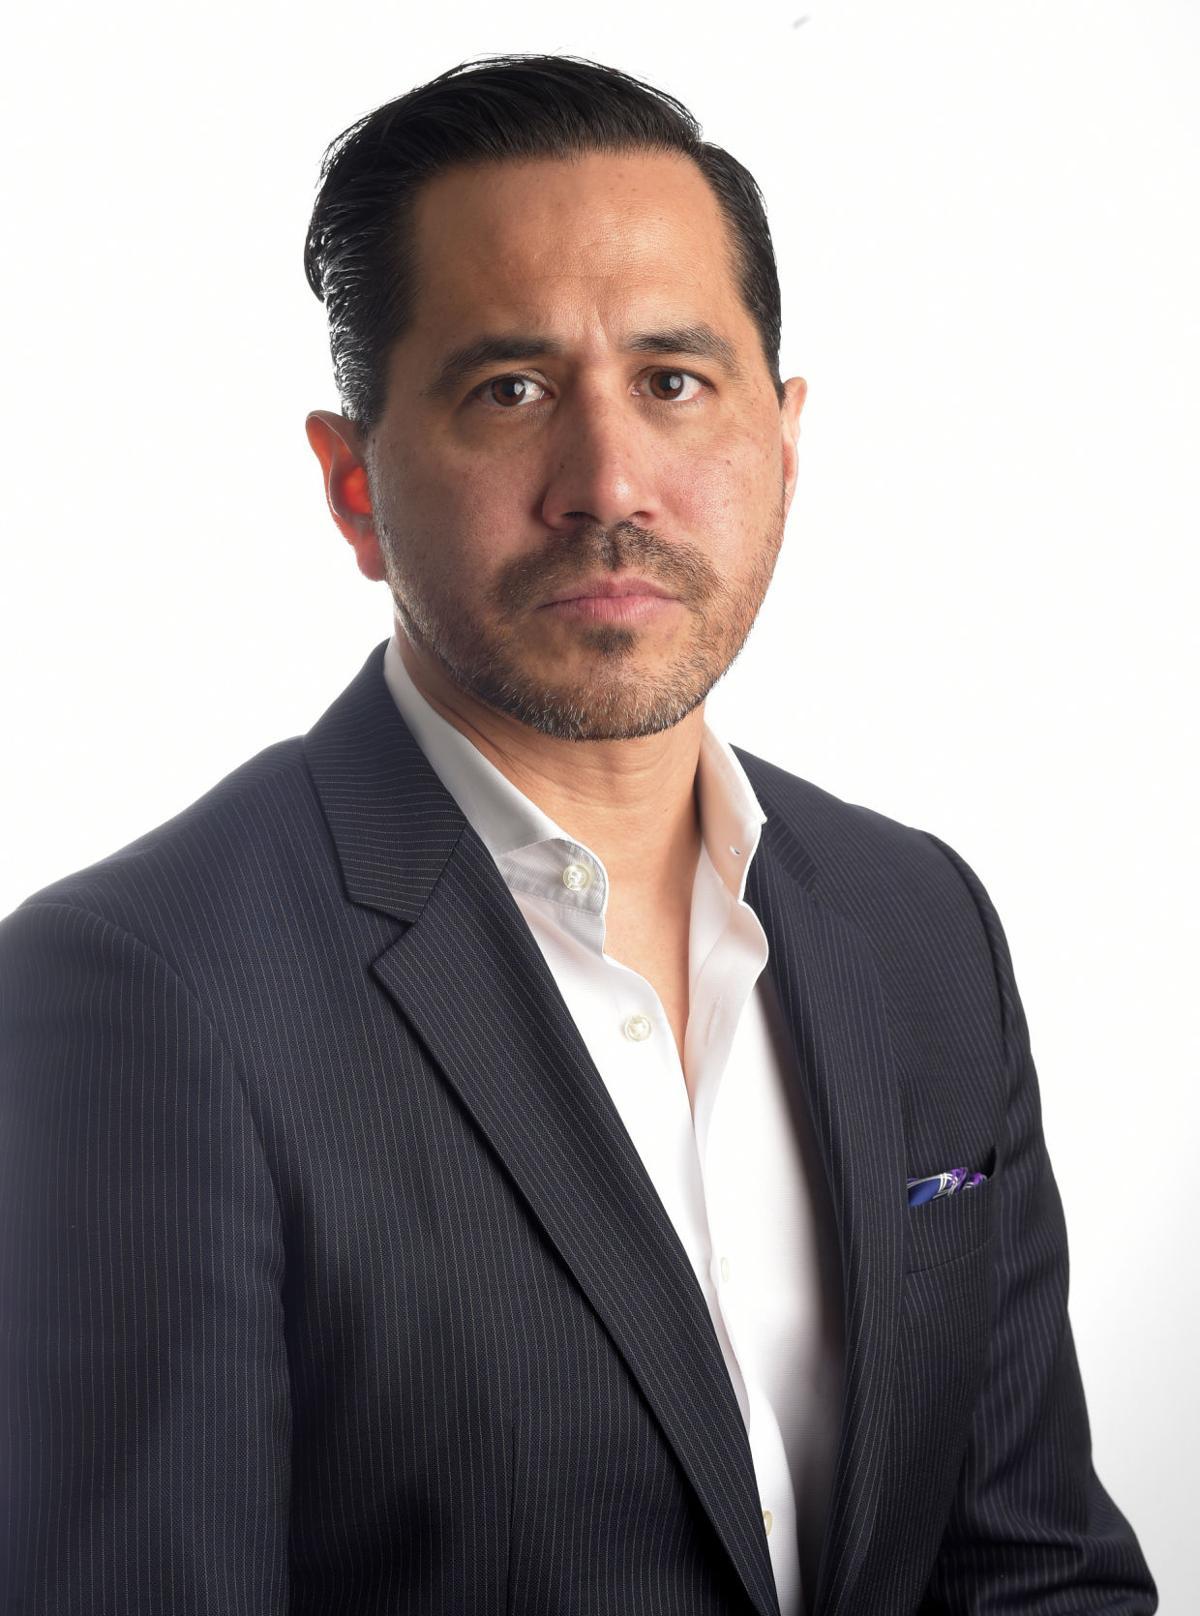 Marco Pesquera